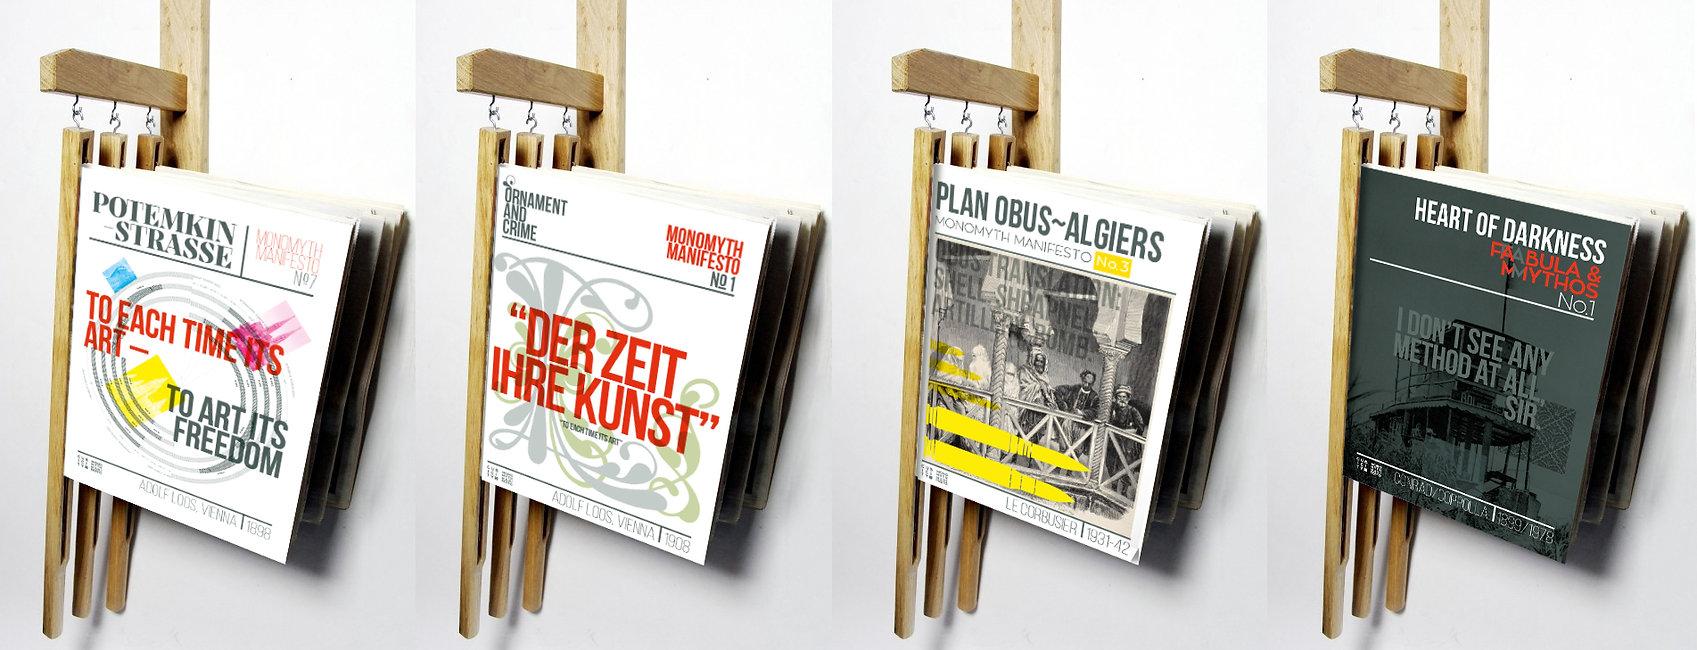 newspaperHanger-Quad1.jpg